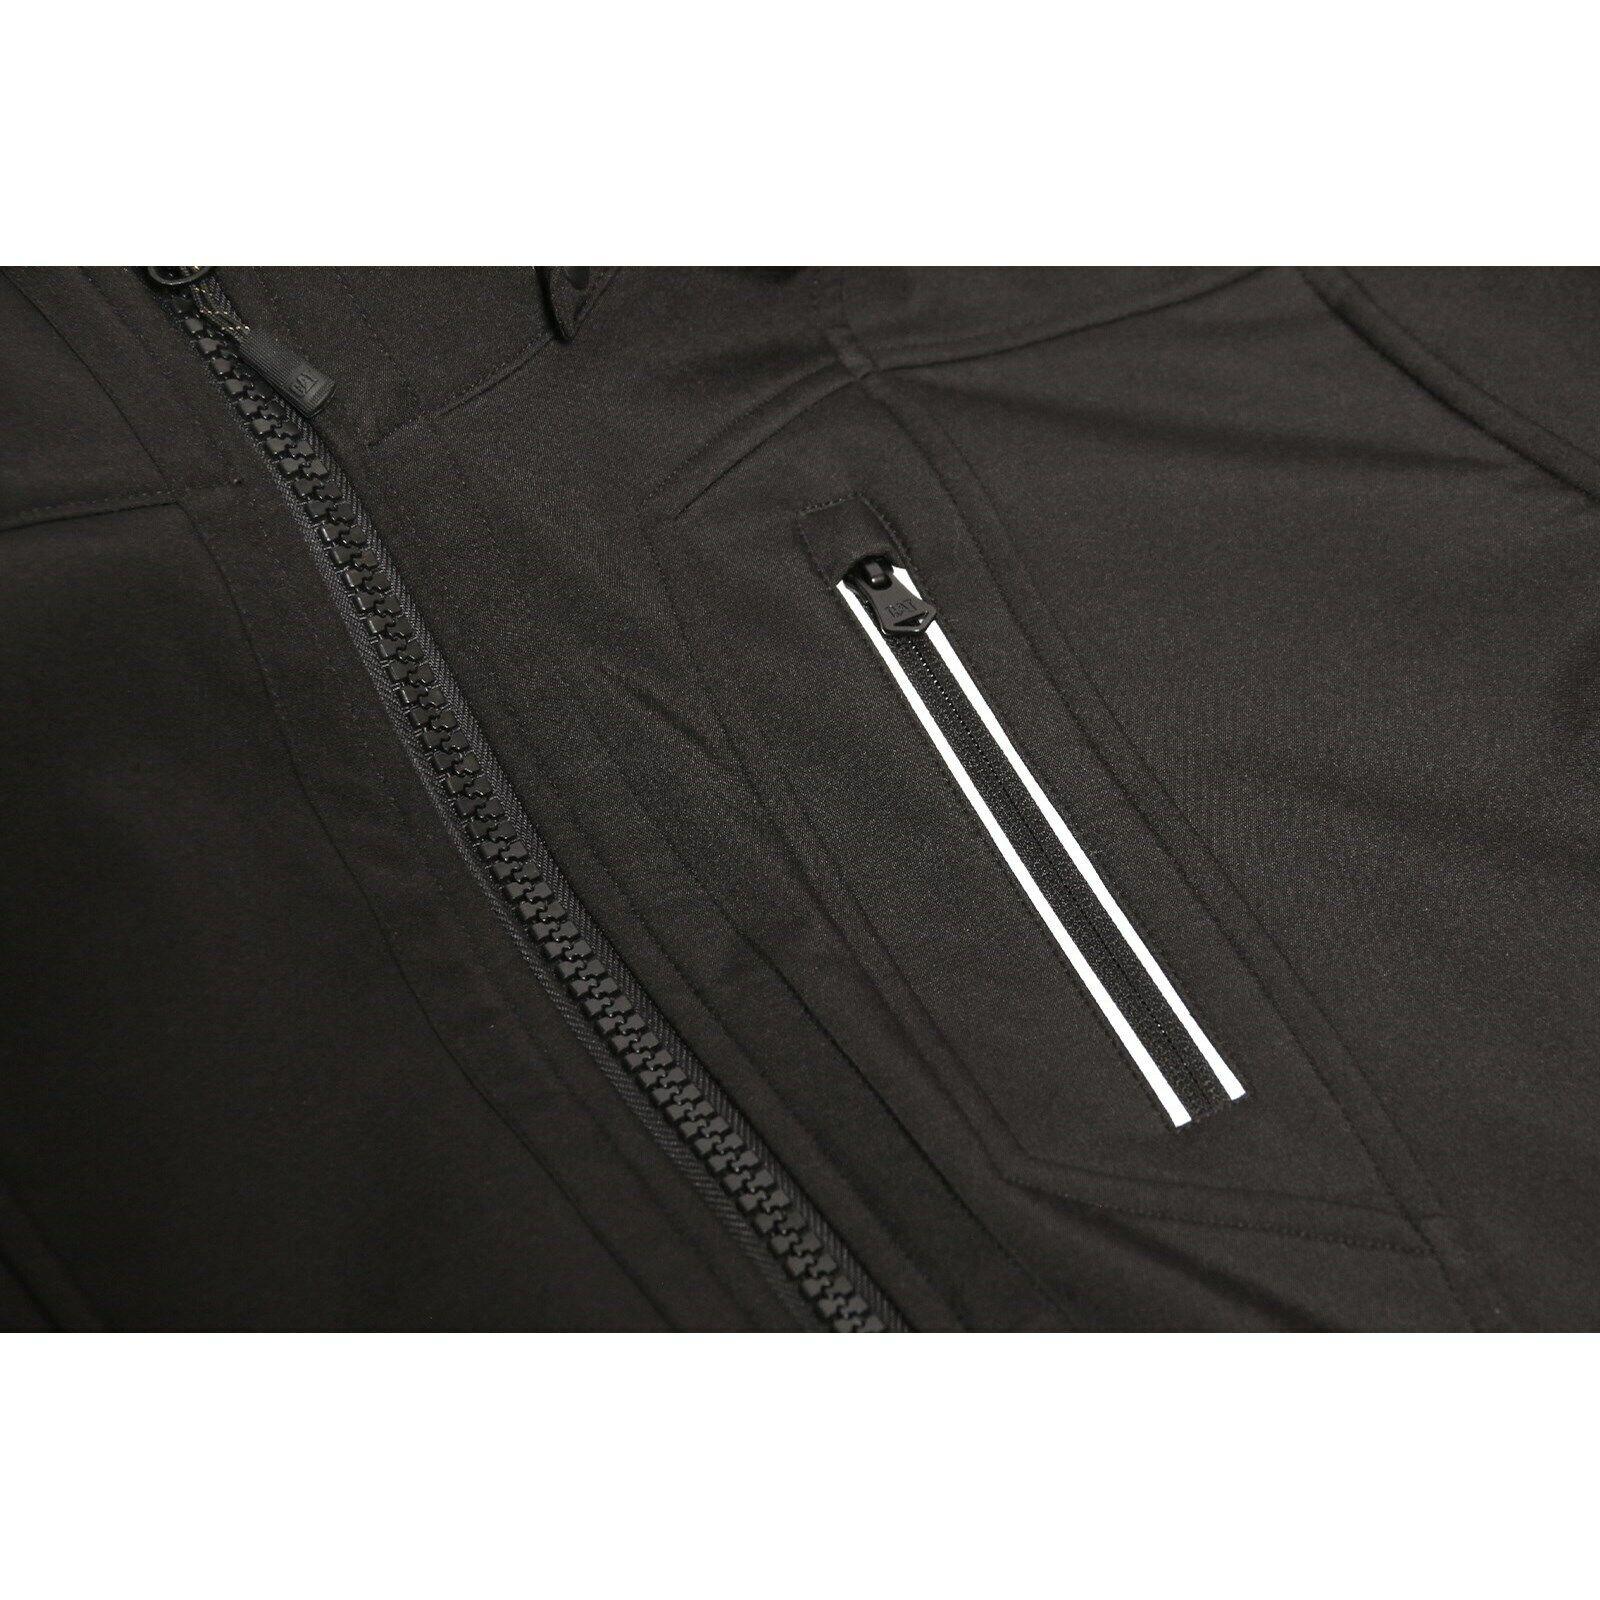 CAT Caterpillar Mercury Jacket Soft Shell Mens Durable Water Resistant Coat